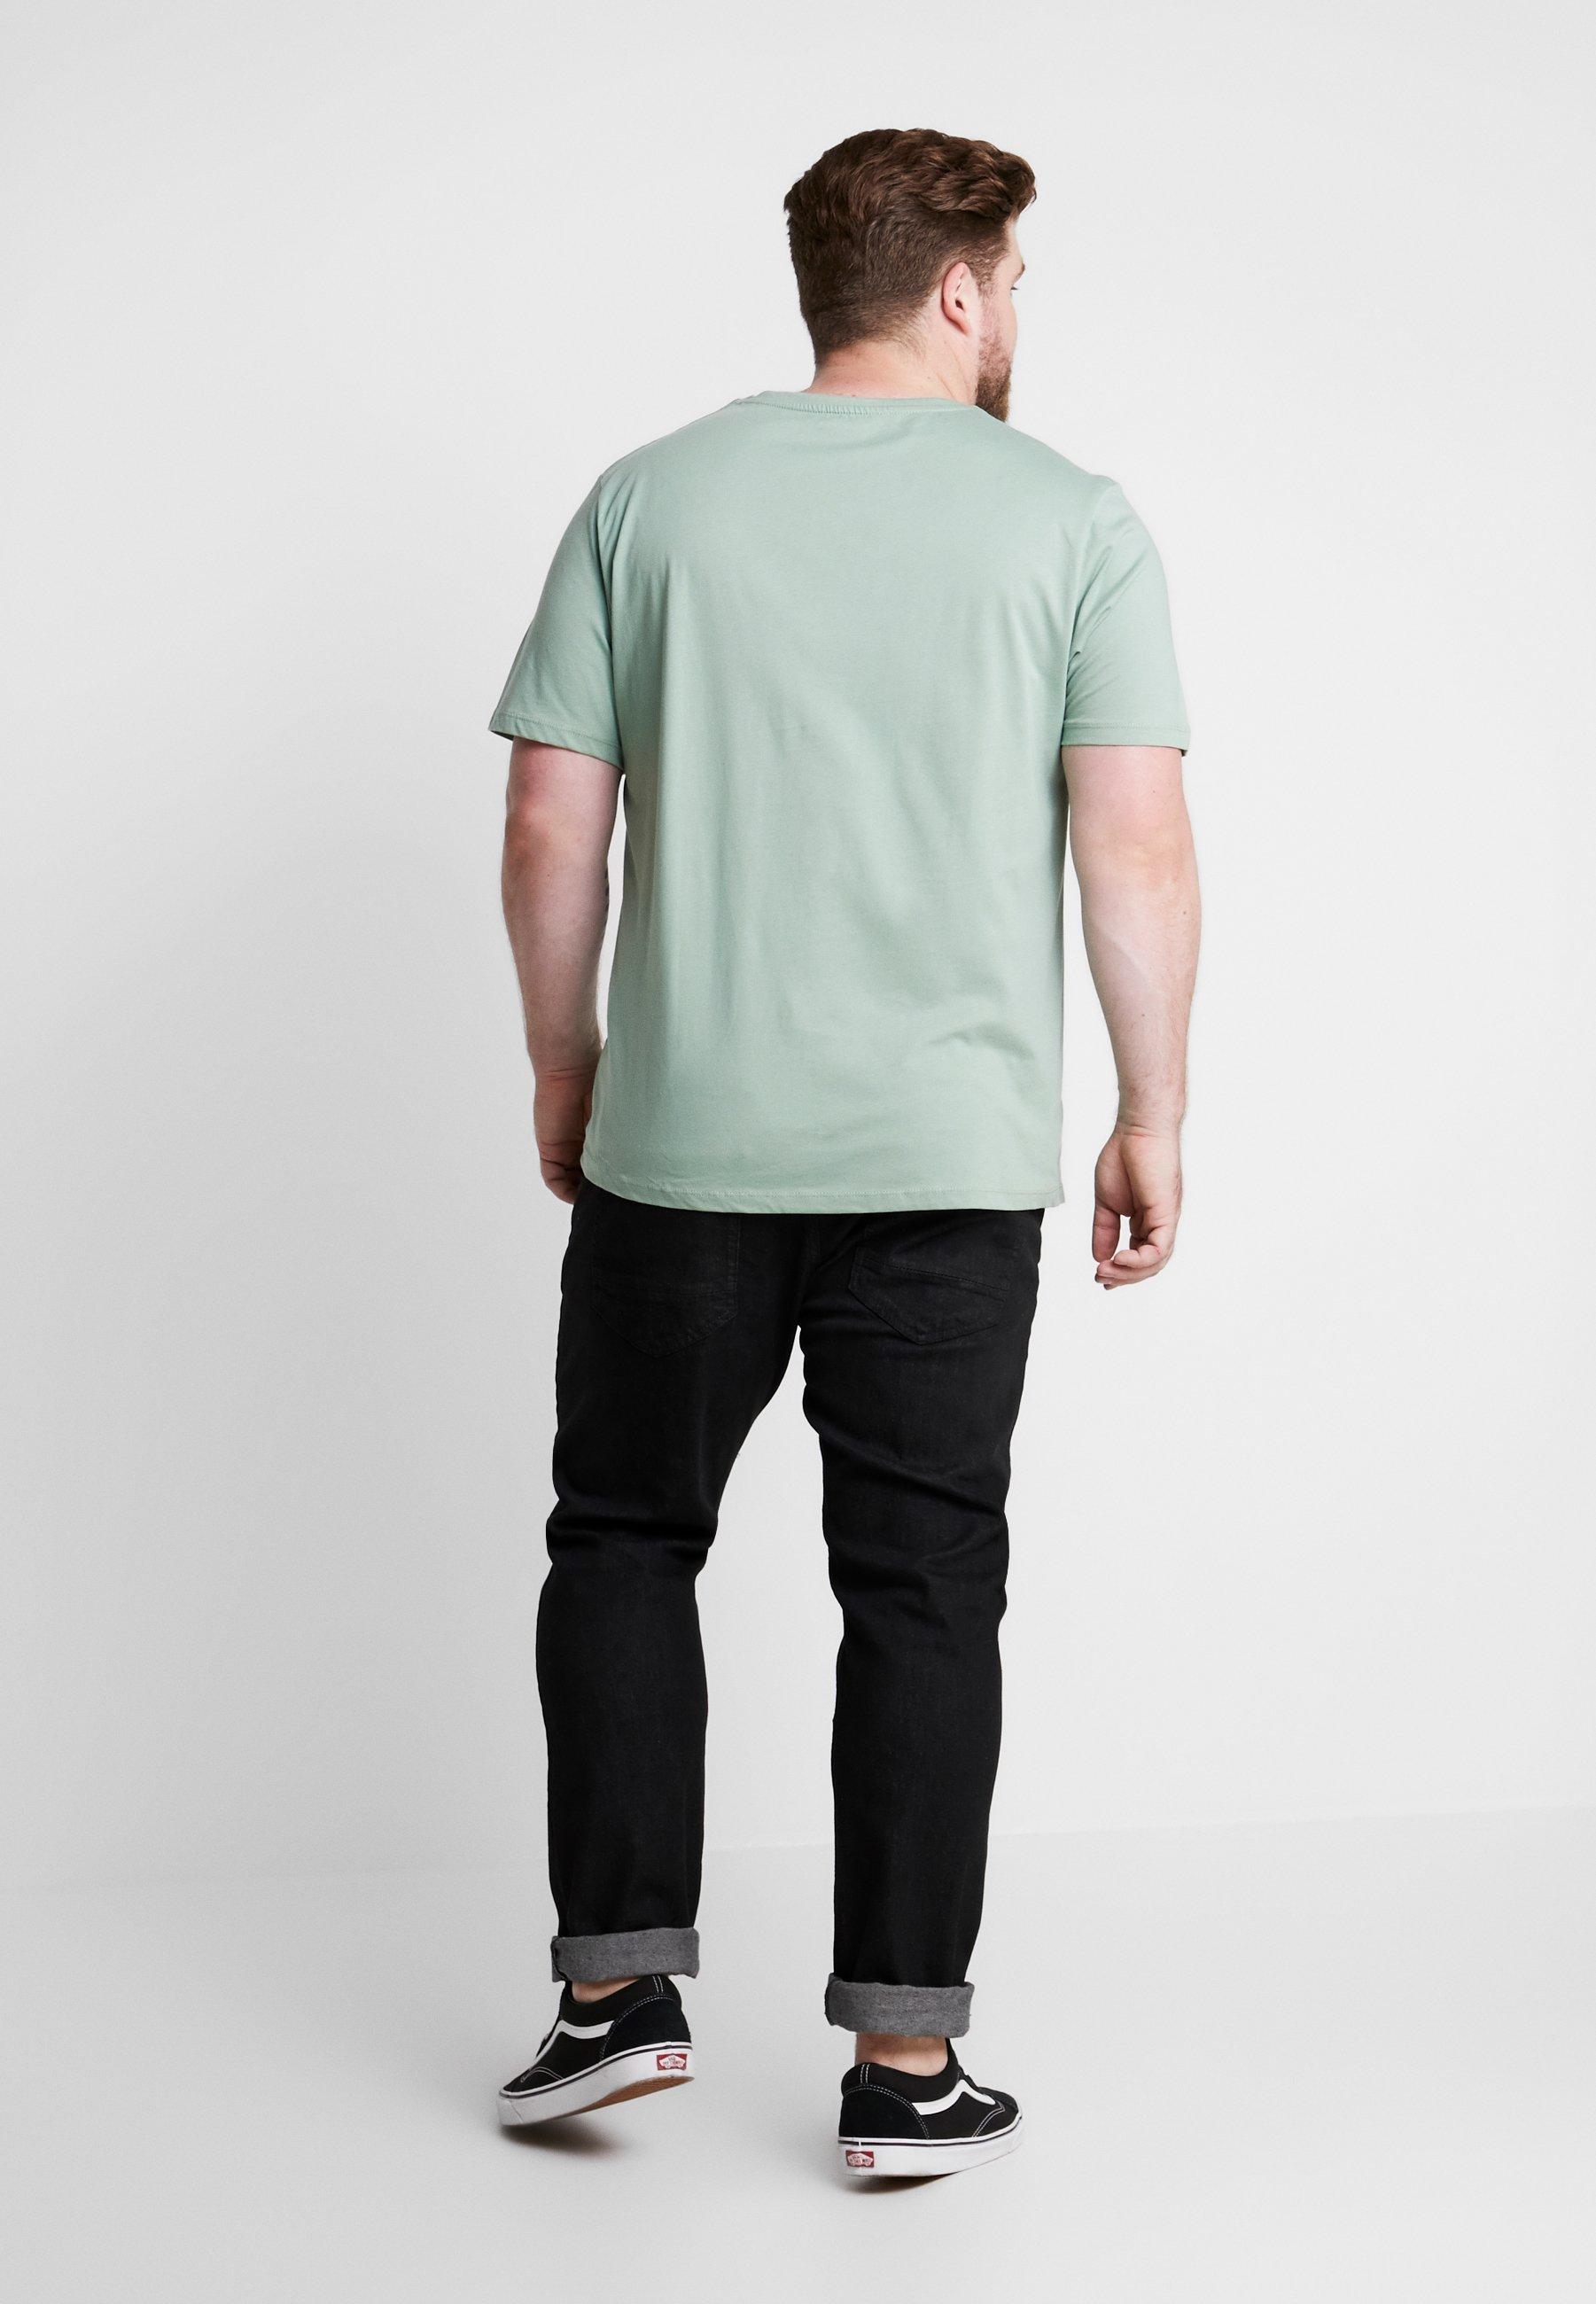 Imprimé Bay NeckT shirt Tee Green Joradventure Jones Crew Jackamp; wkPXn0O8